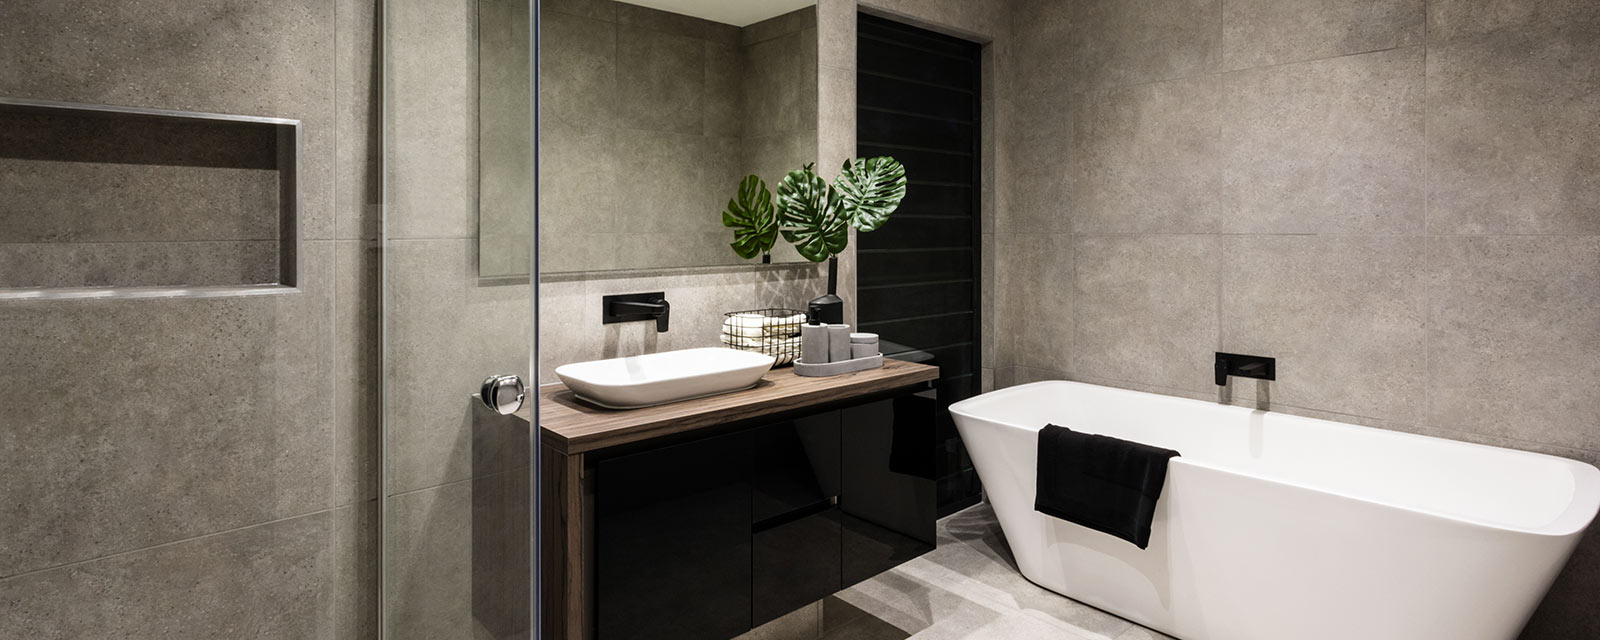 Conseils pour rénover une salle de bains   Guide Artisan